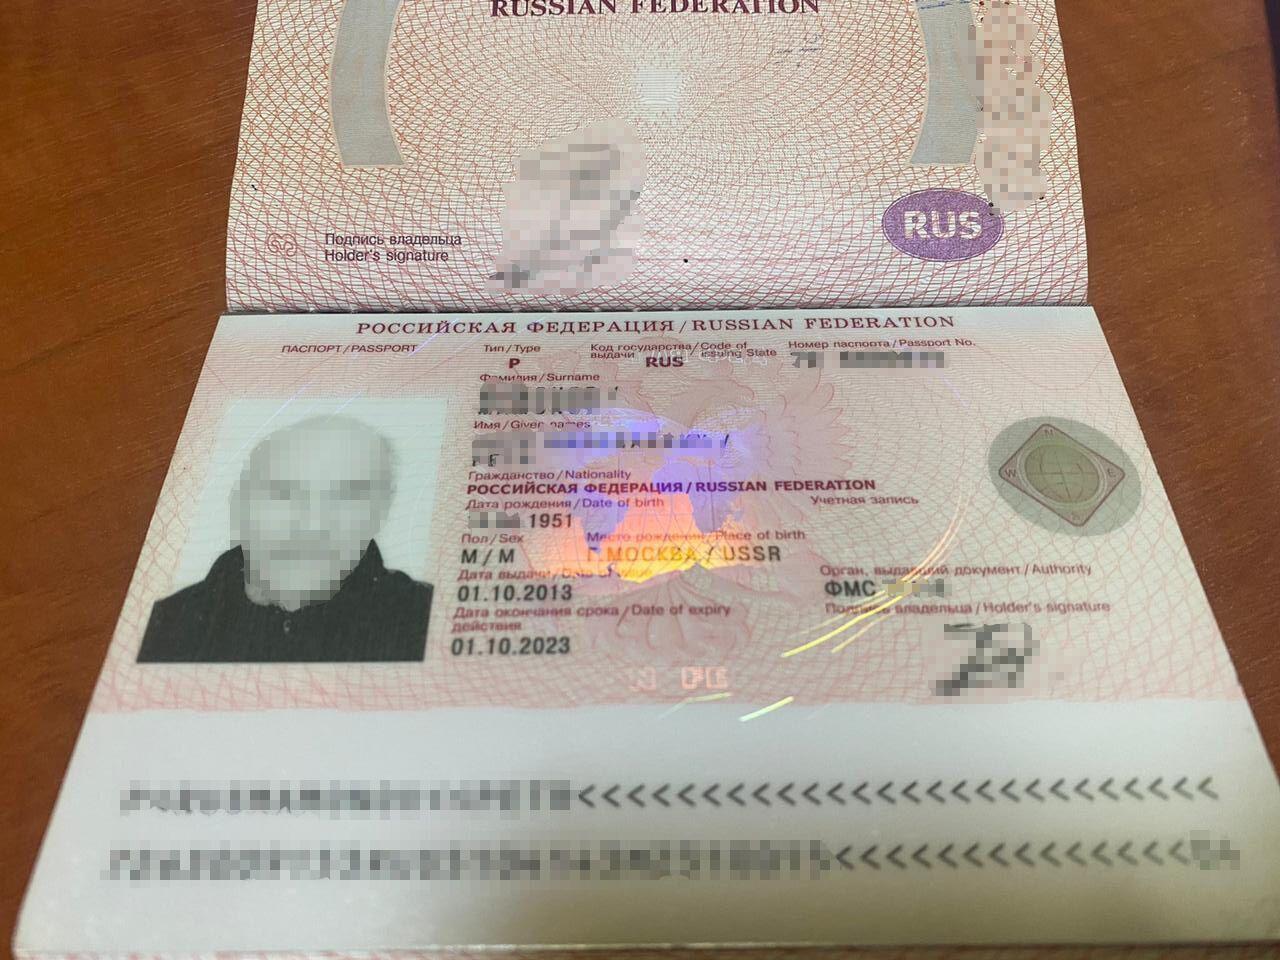 Паспорт росіянина, якого не пустили в Україну